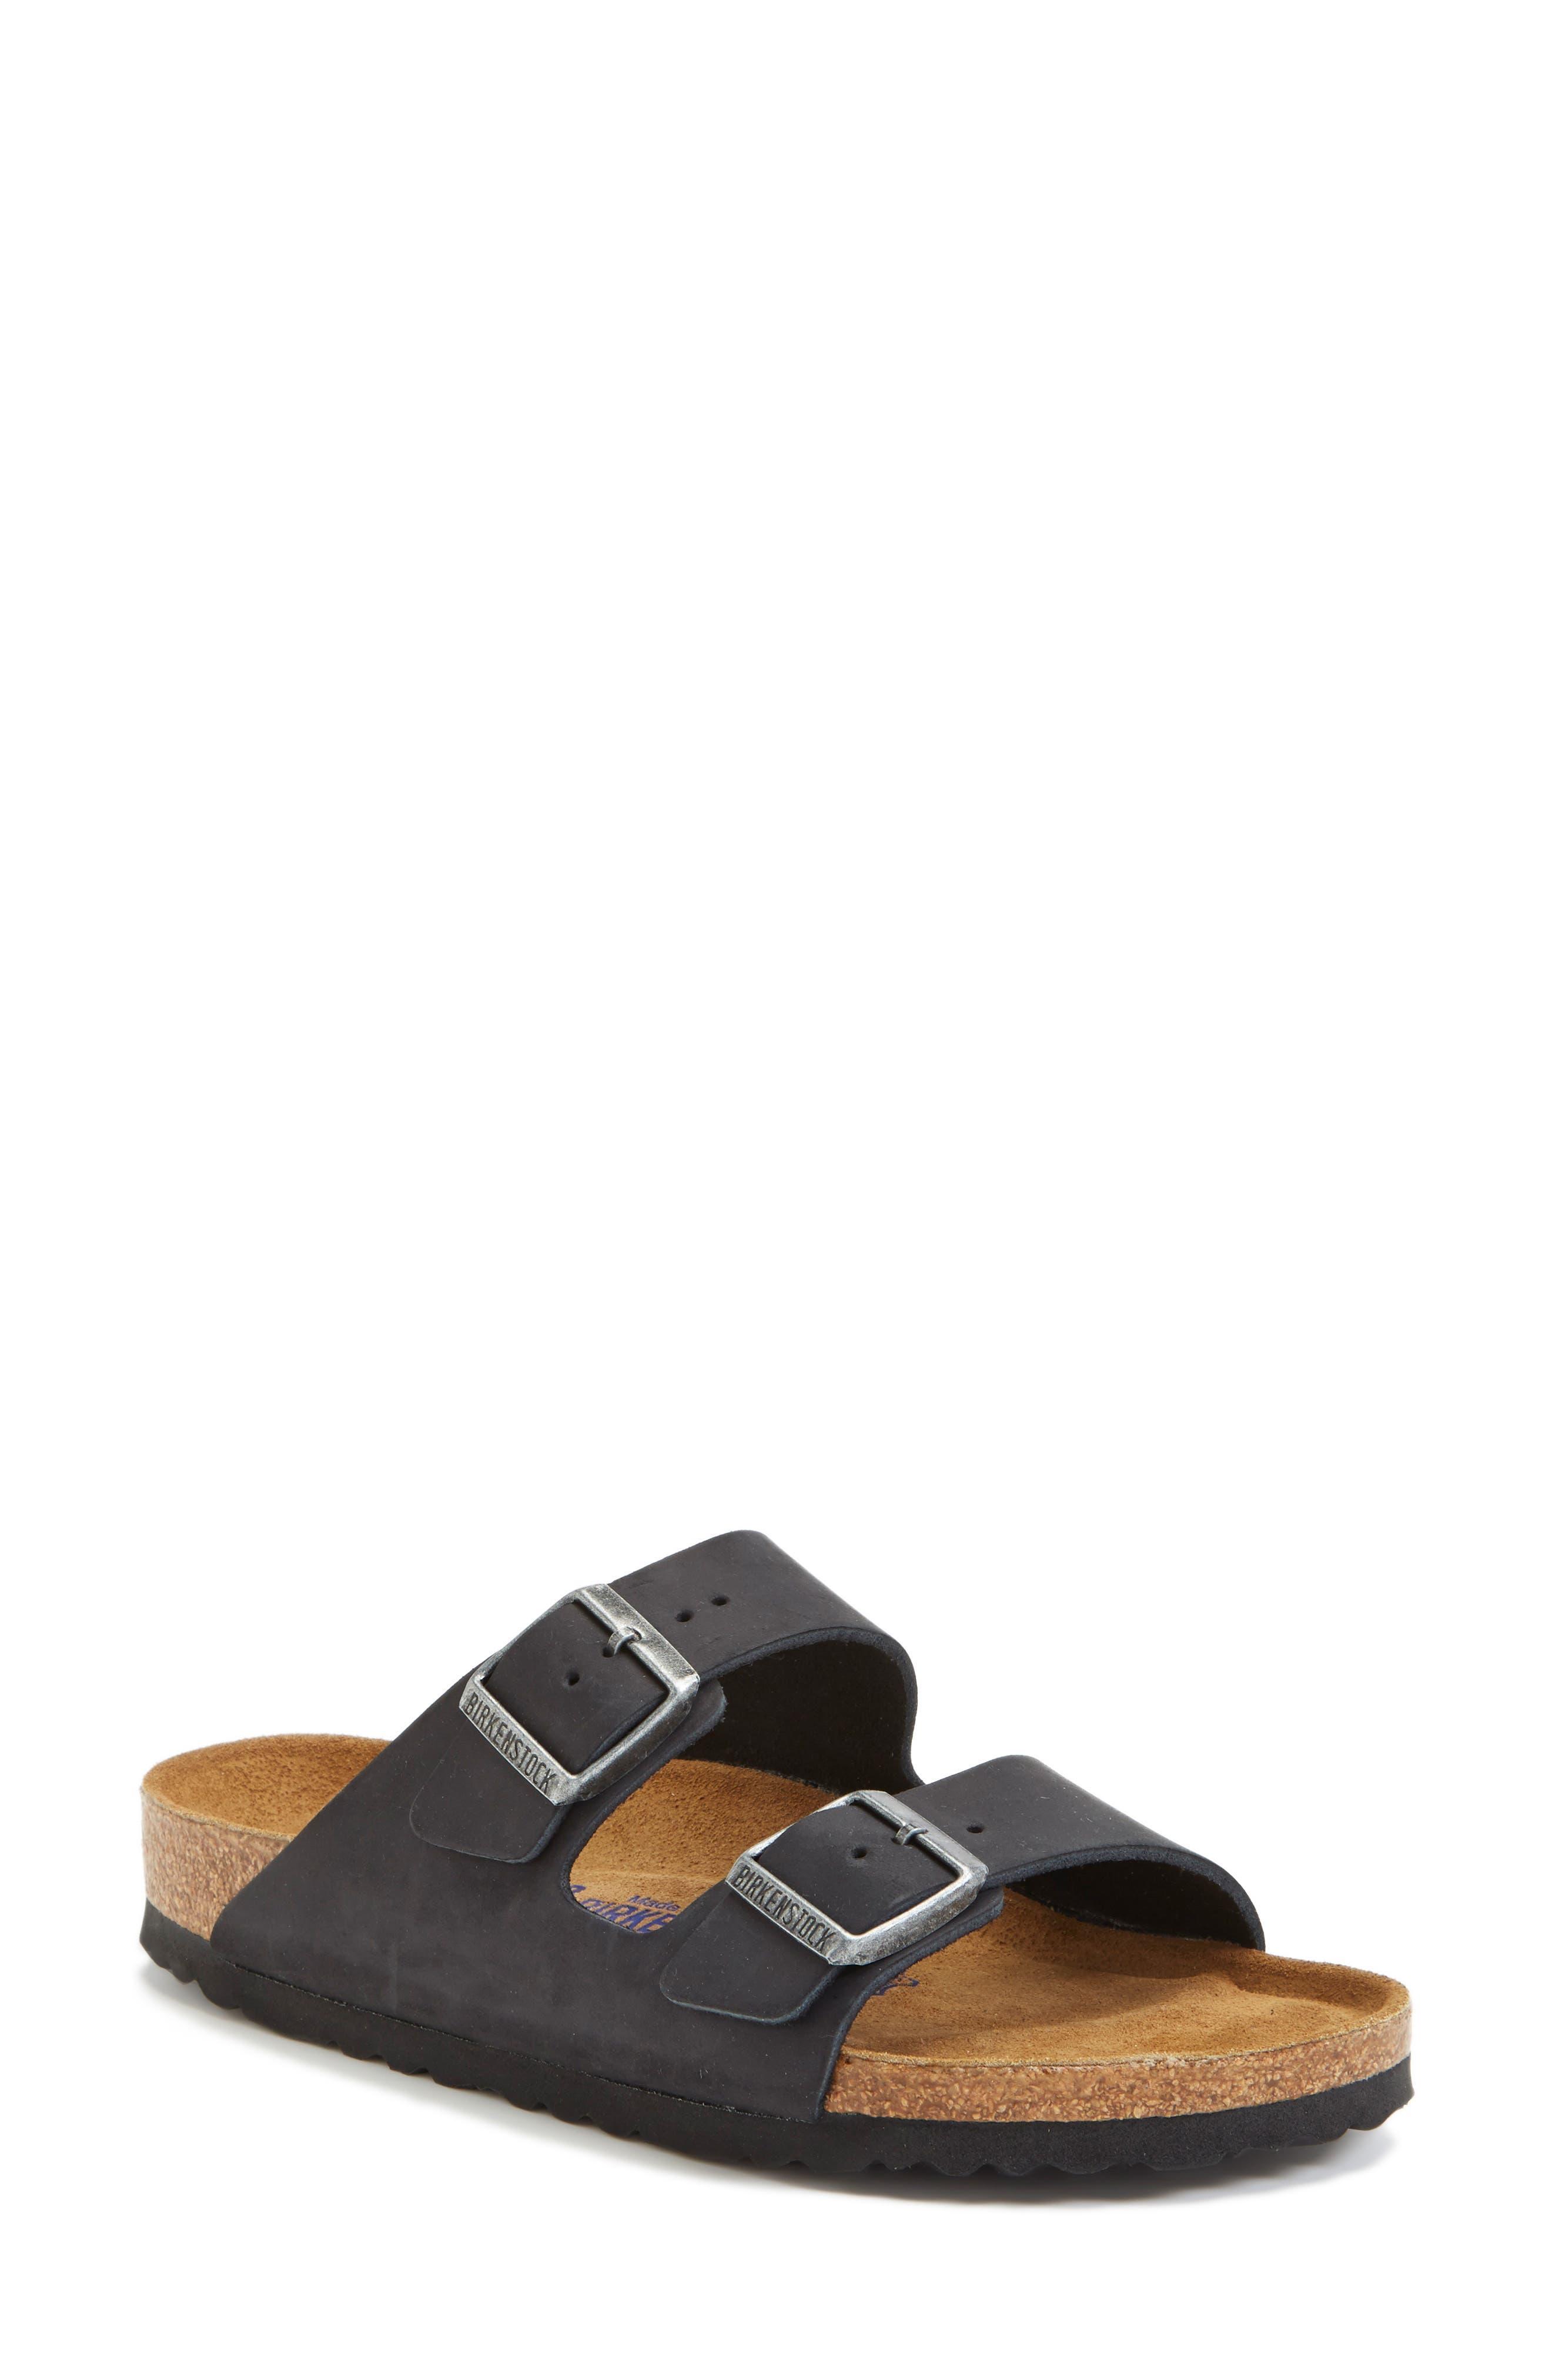 BIRKENSTOCK, Arizona Soft Footbed Sandal, Main thumbnail 1, color, BLACK/ BLACK